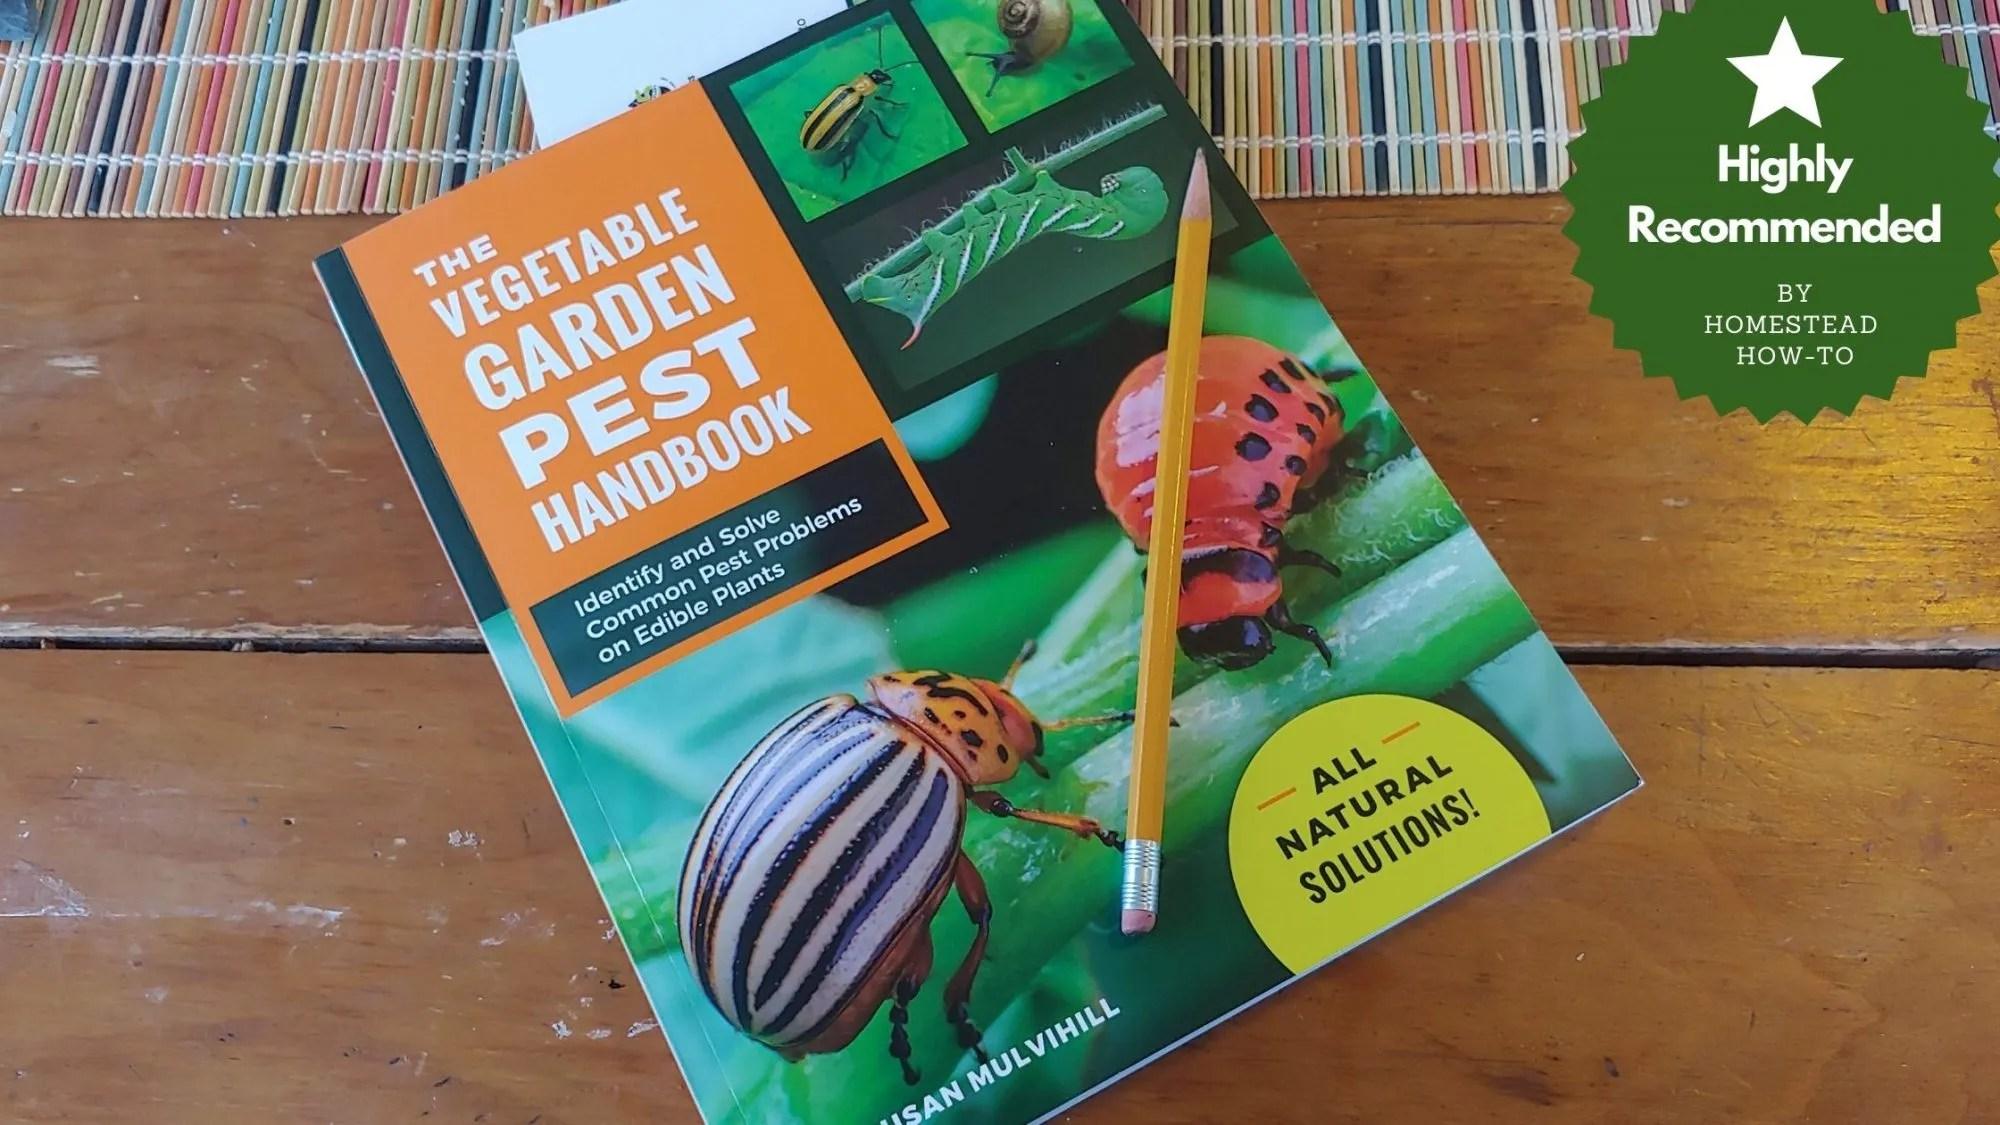 Book Review: The Vegetable Garden Pest Handbook